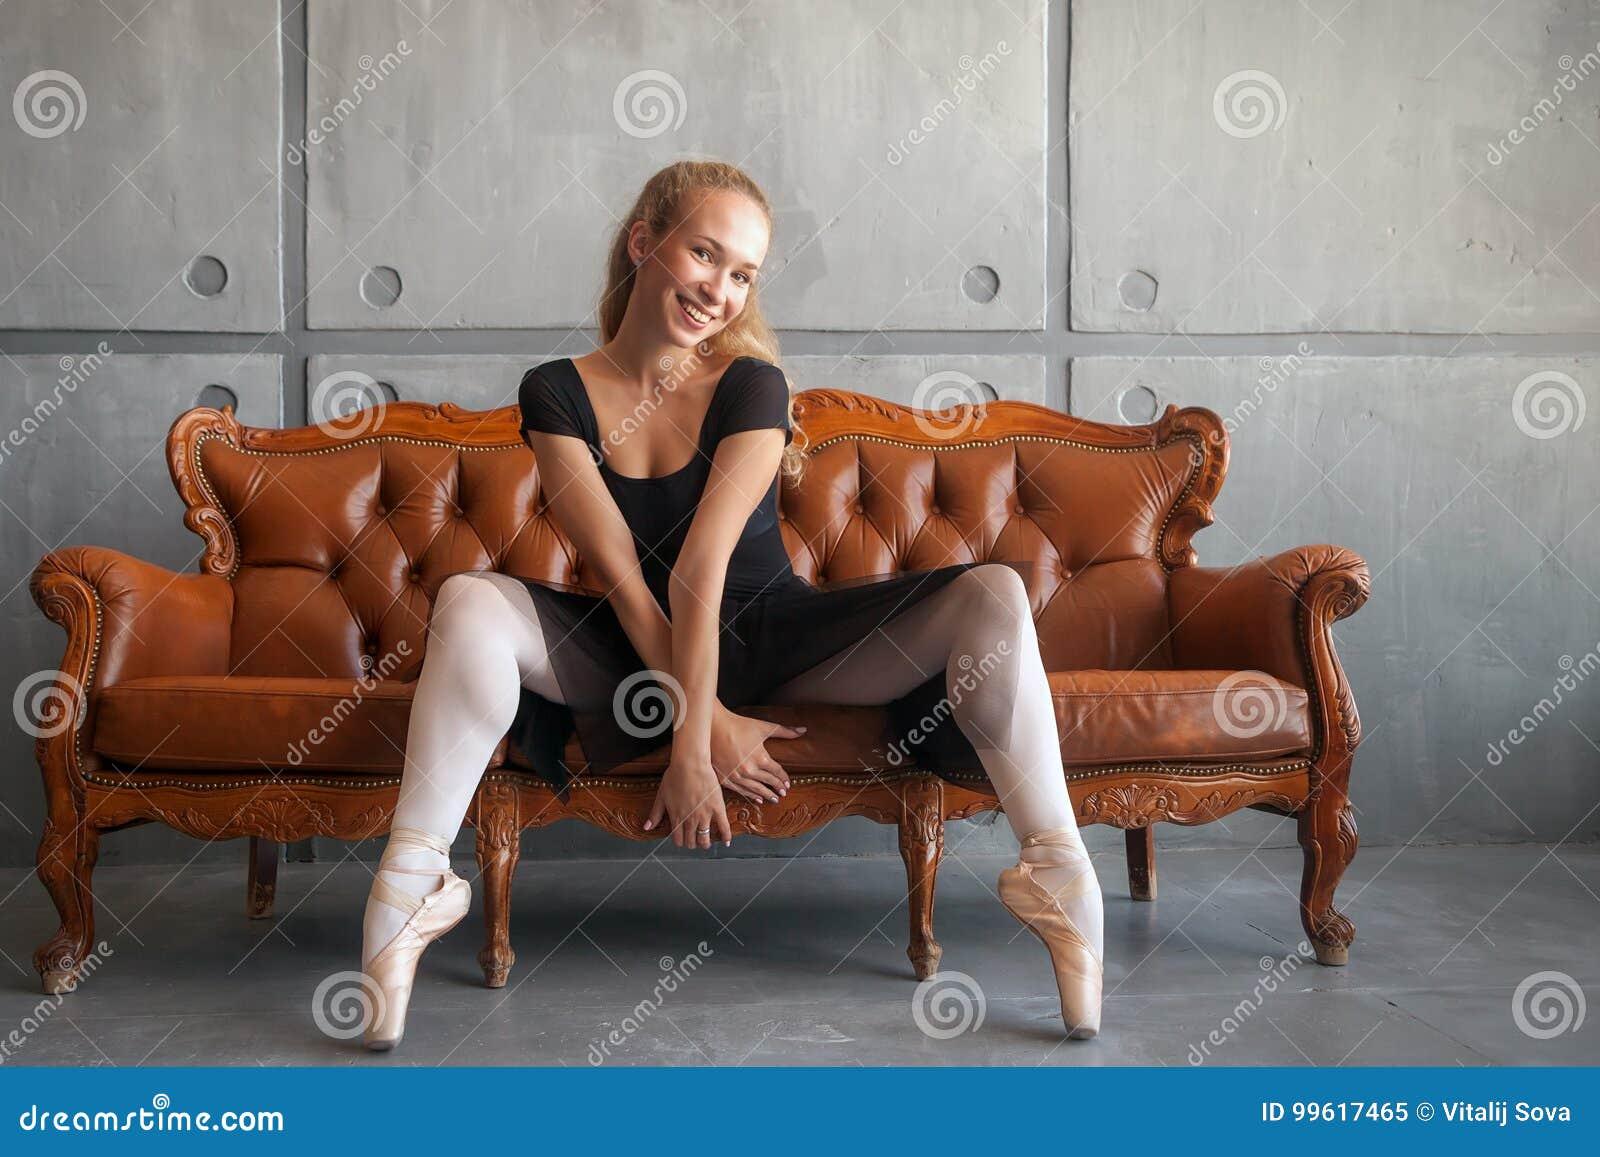 A bailarina senta-se no sofá